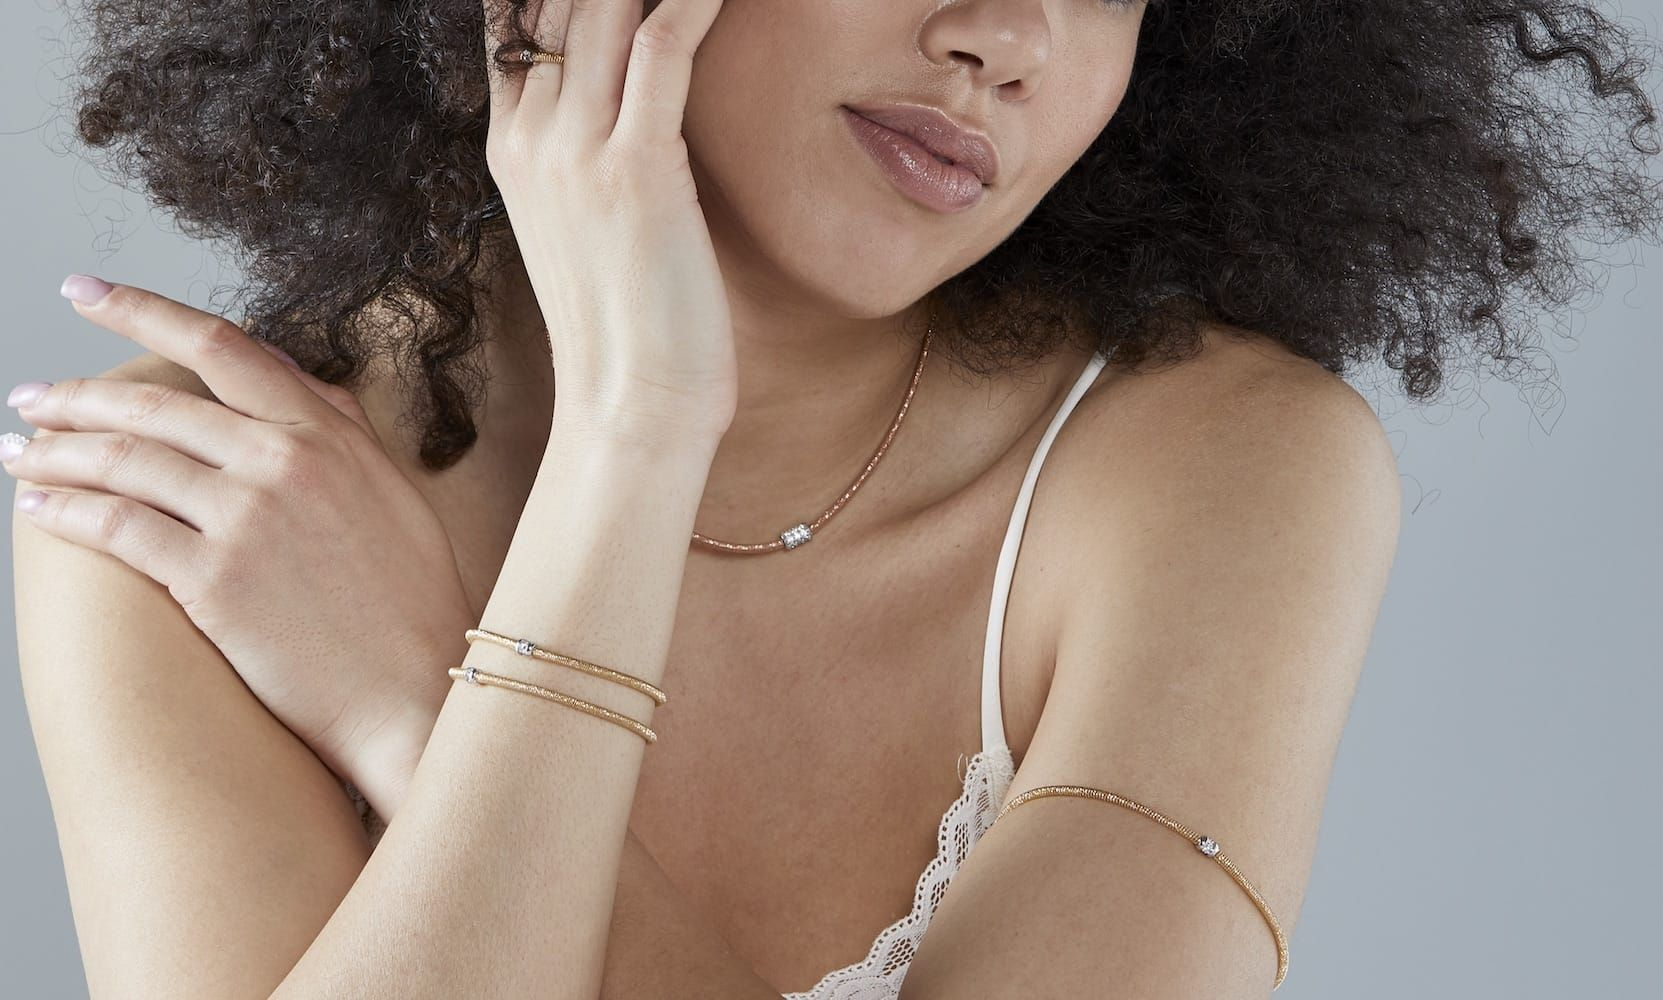 donde comprar online joyas magicwire mejor precio - extraglitter anillos pulseras colgantes oro - joyas mujer flexibles - joyeria marga mira